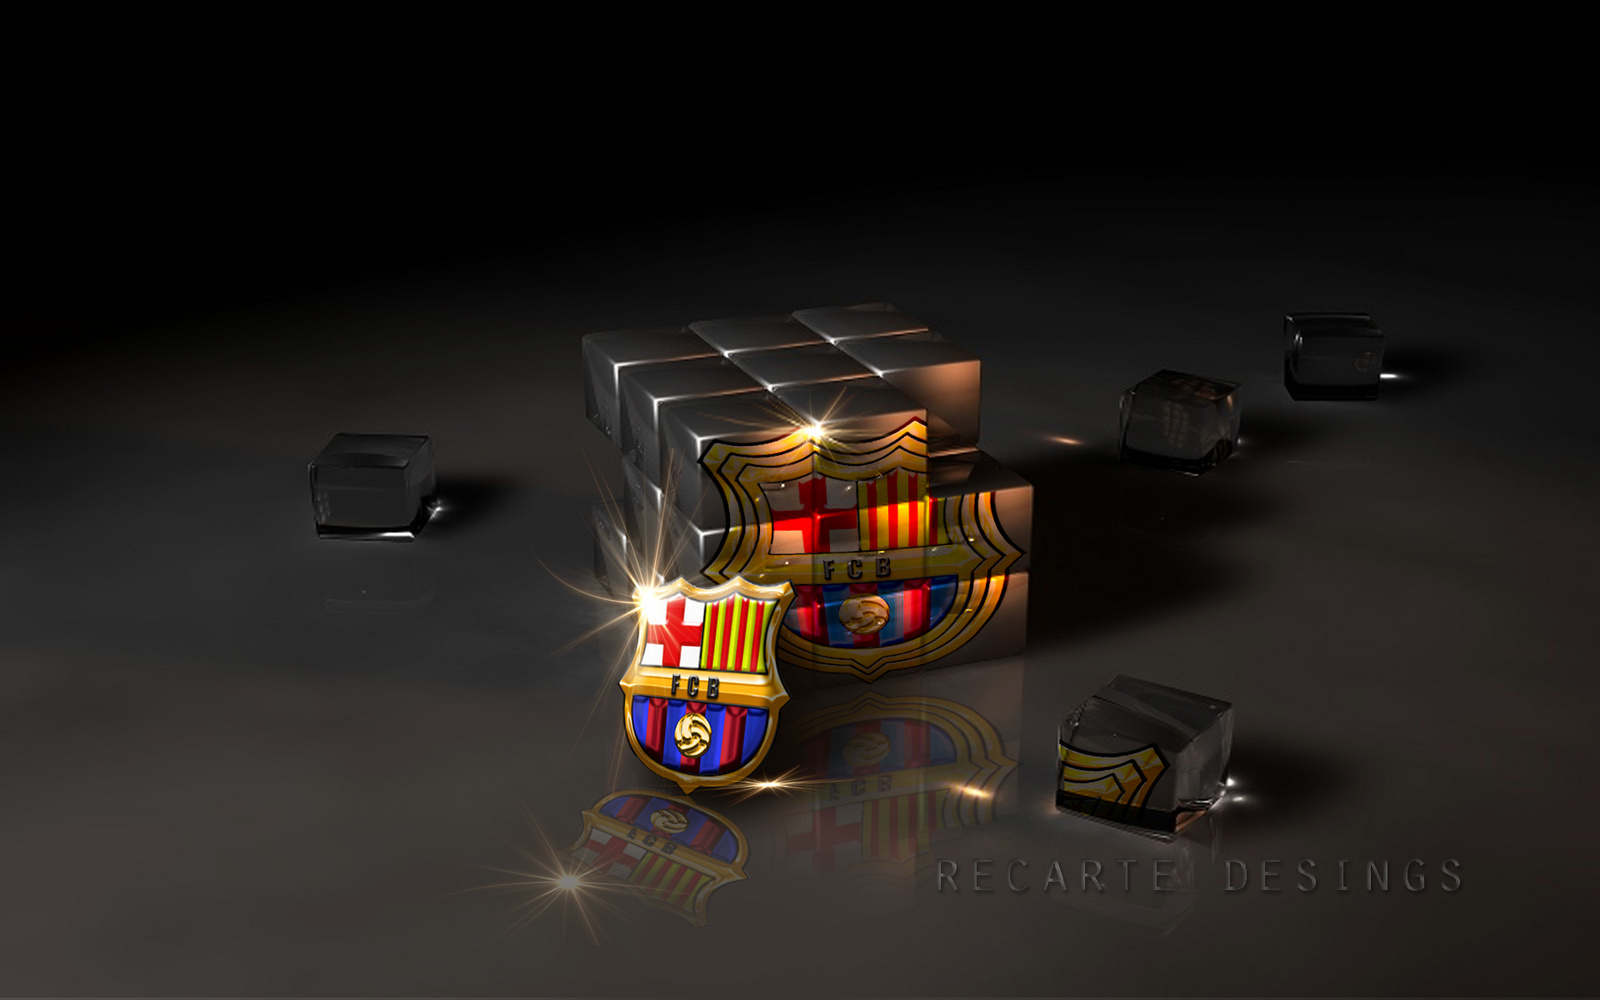 http://3.bp.blogspot.com/-MPxFVG4KDA0/T1MvVNv32eI/AAAAAAAABaQ/DFrr9aU9OQ4/s1600/FC+Barcelona+avatar.jpg